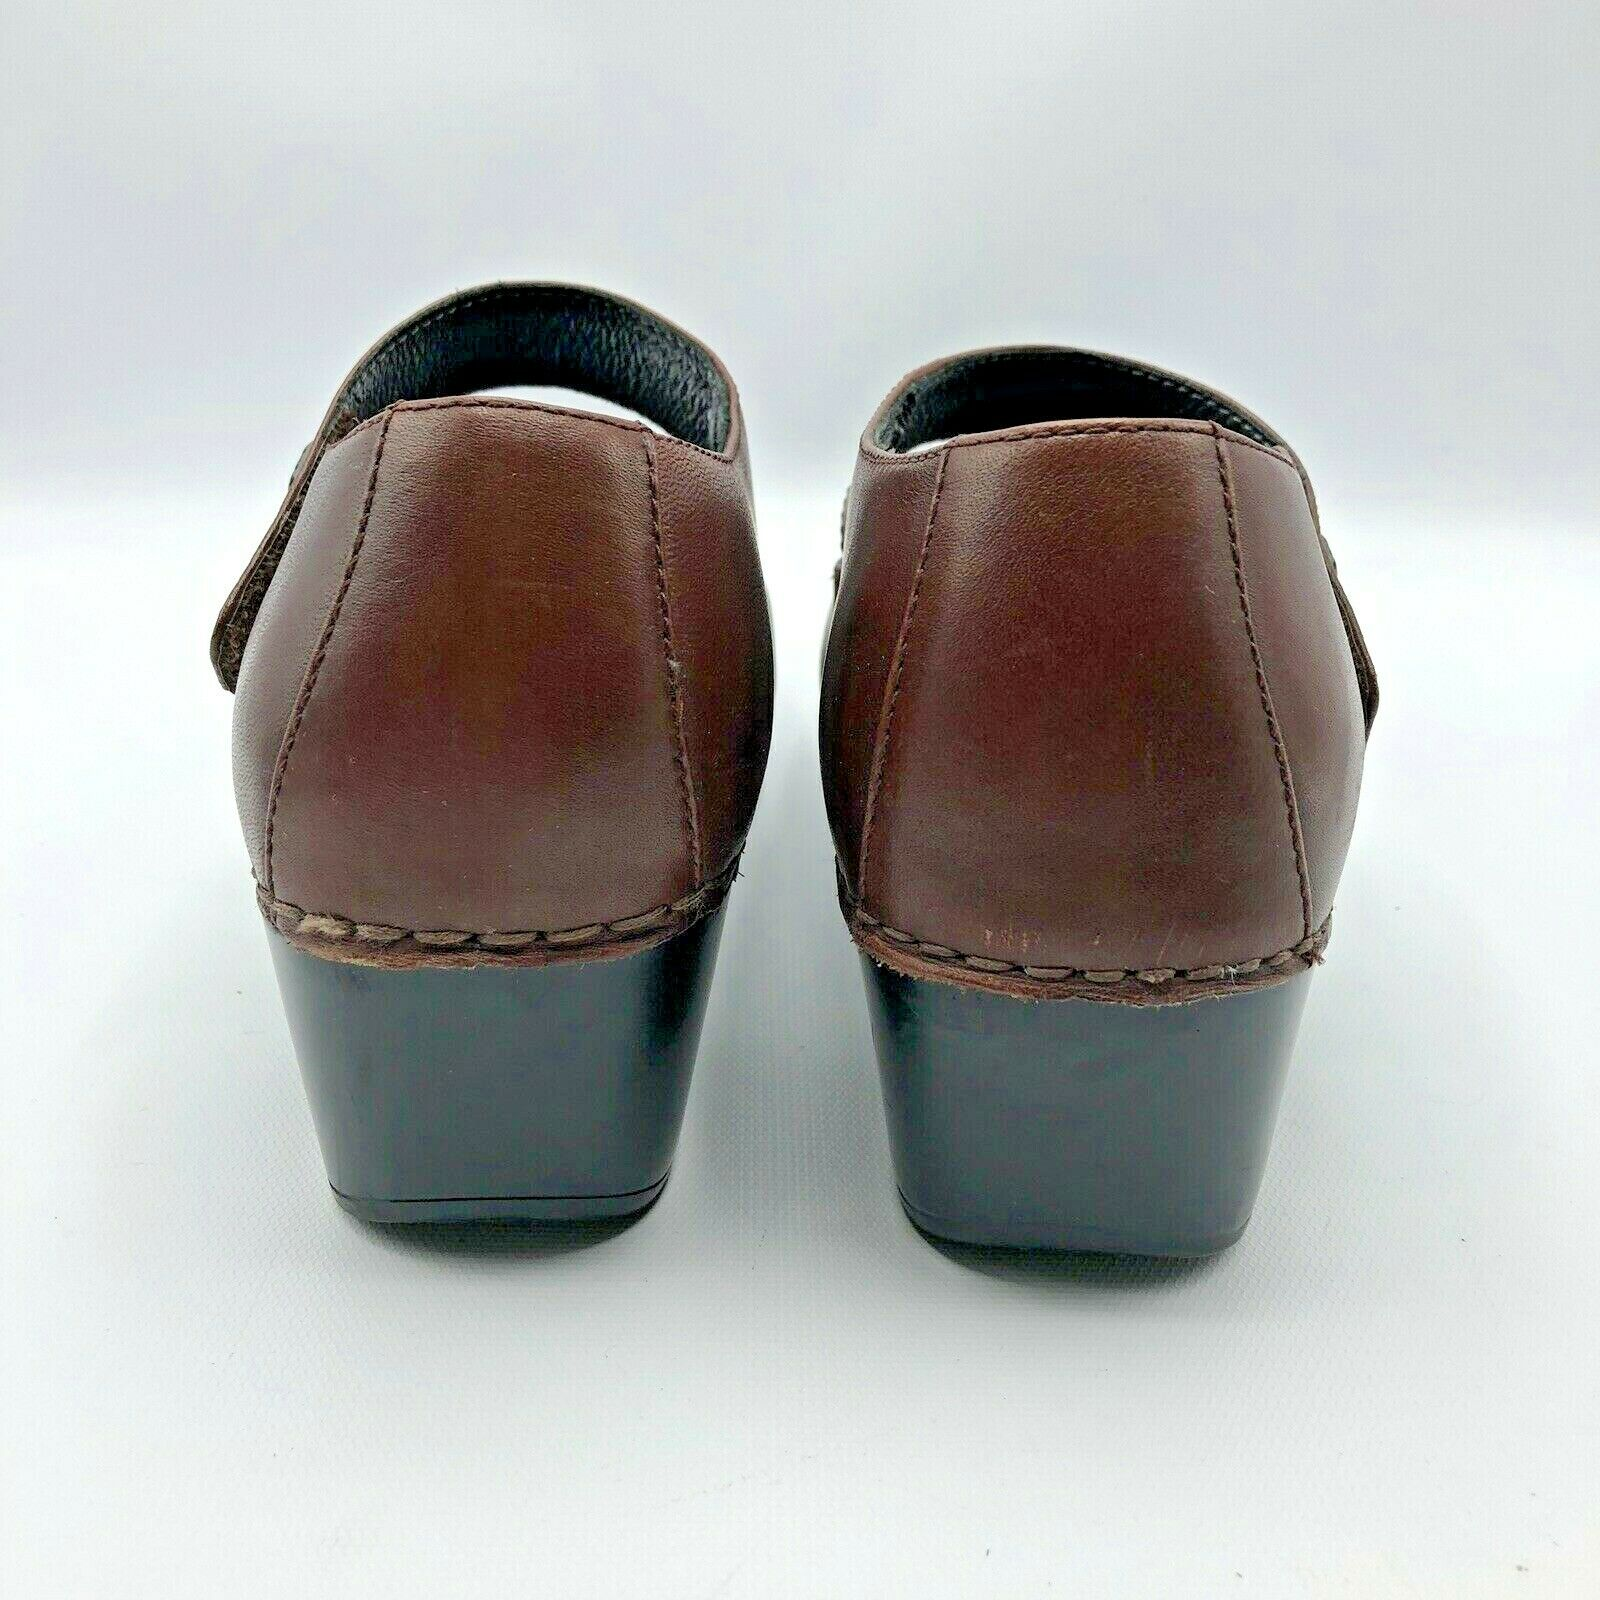 Dansko Tandy Women Cordovan Burnished Full Grain Grain Grain Mary Jane shoes SZ 9.5-10 EUR 40 f01e5a